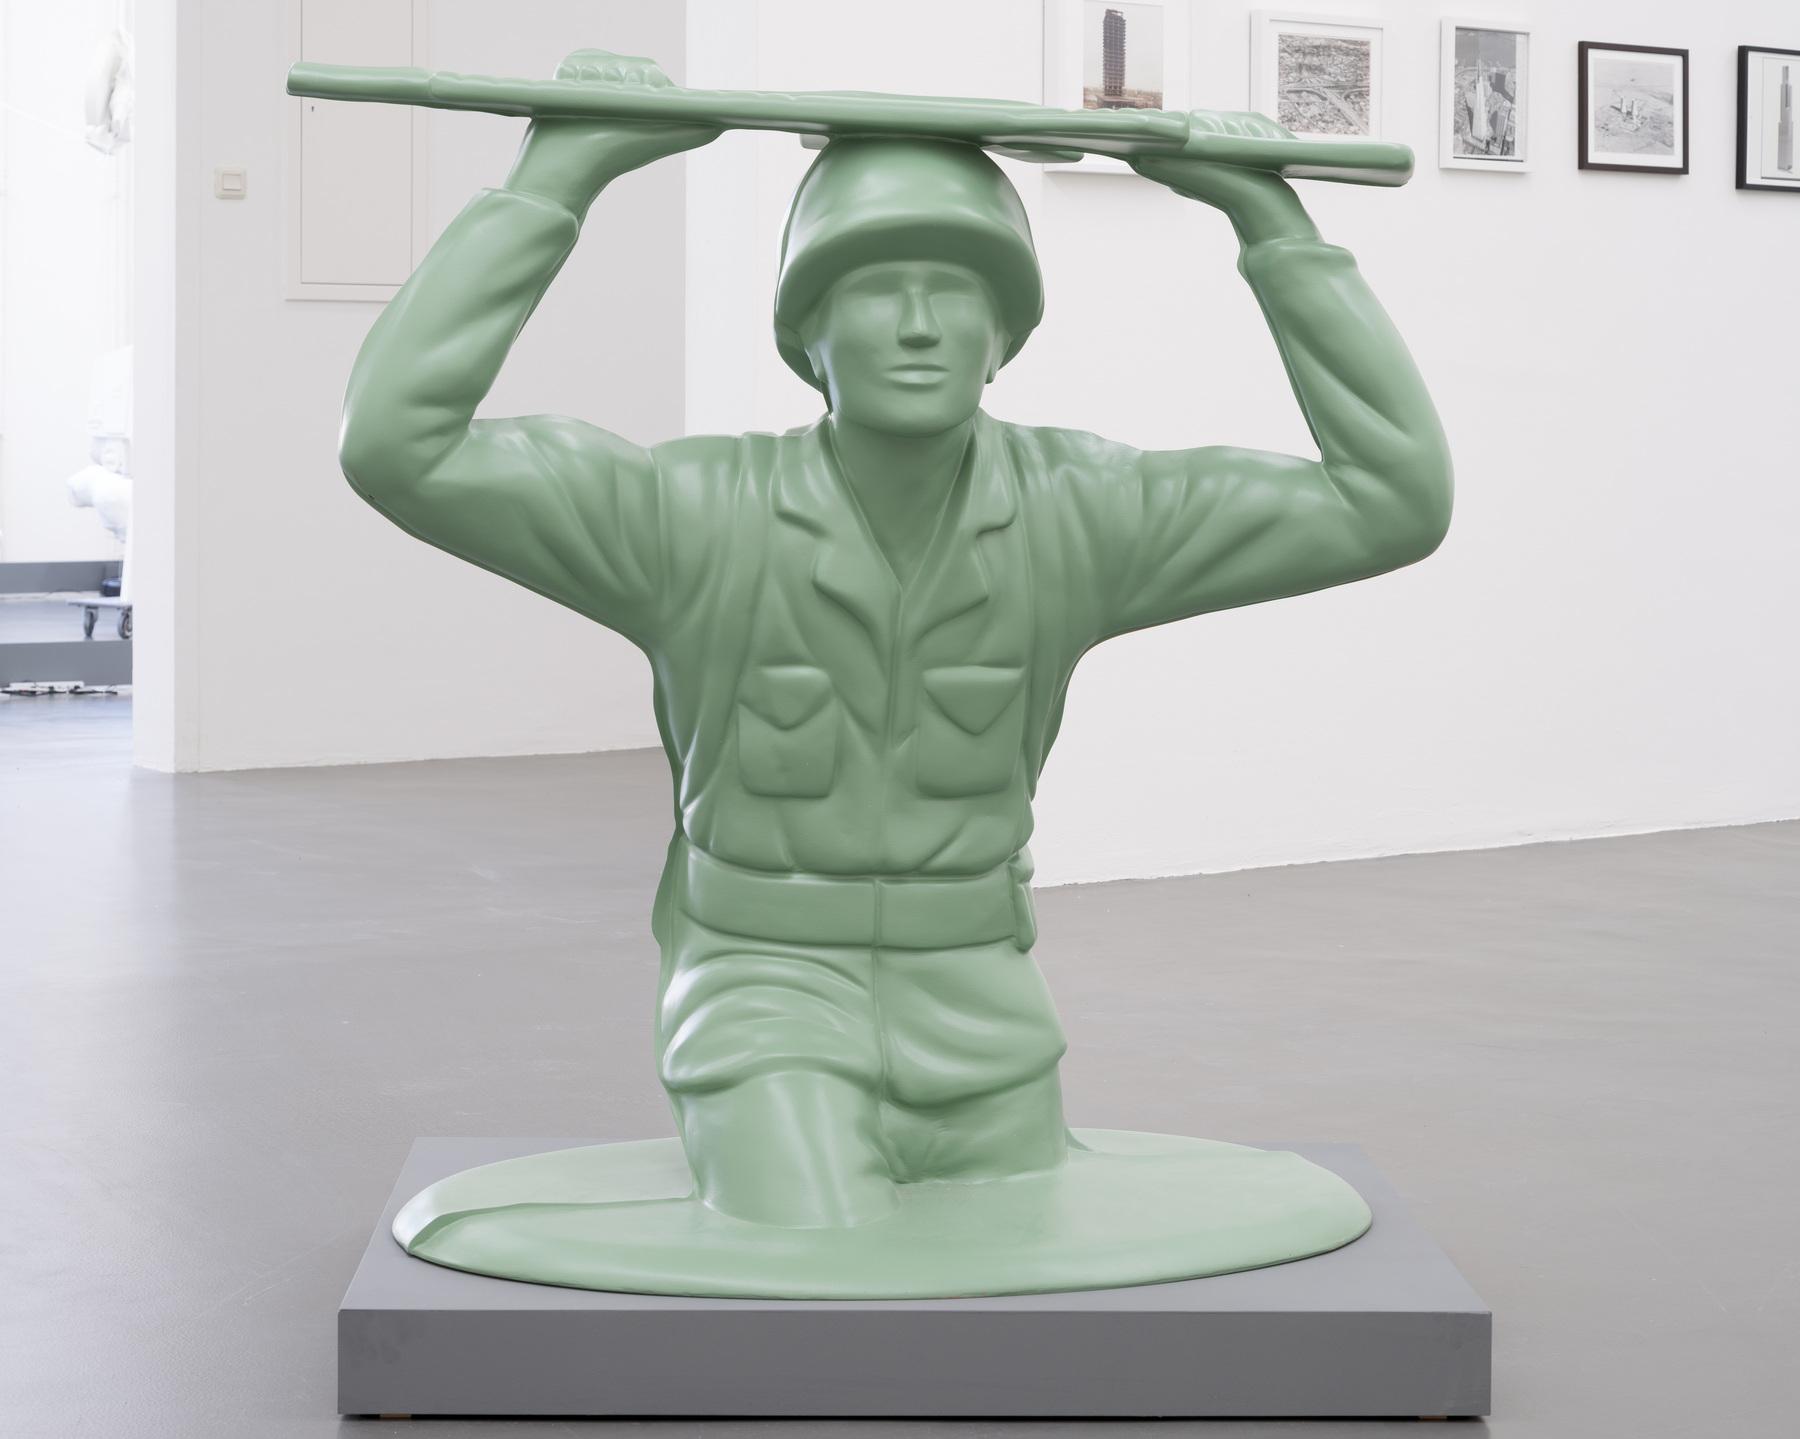 29_Douglas Coupland_Vietnam soldier